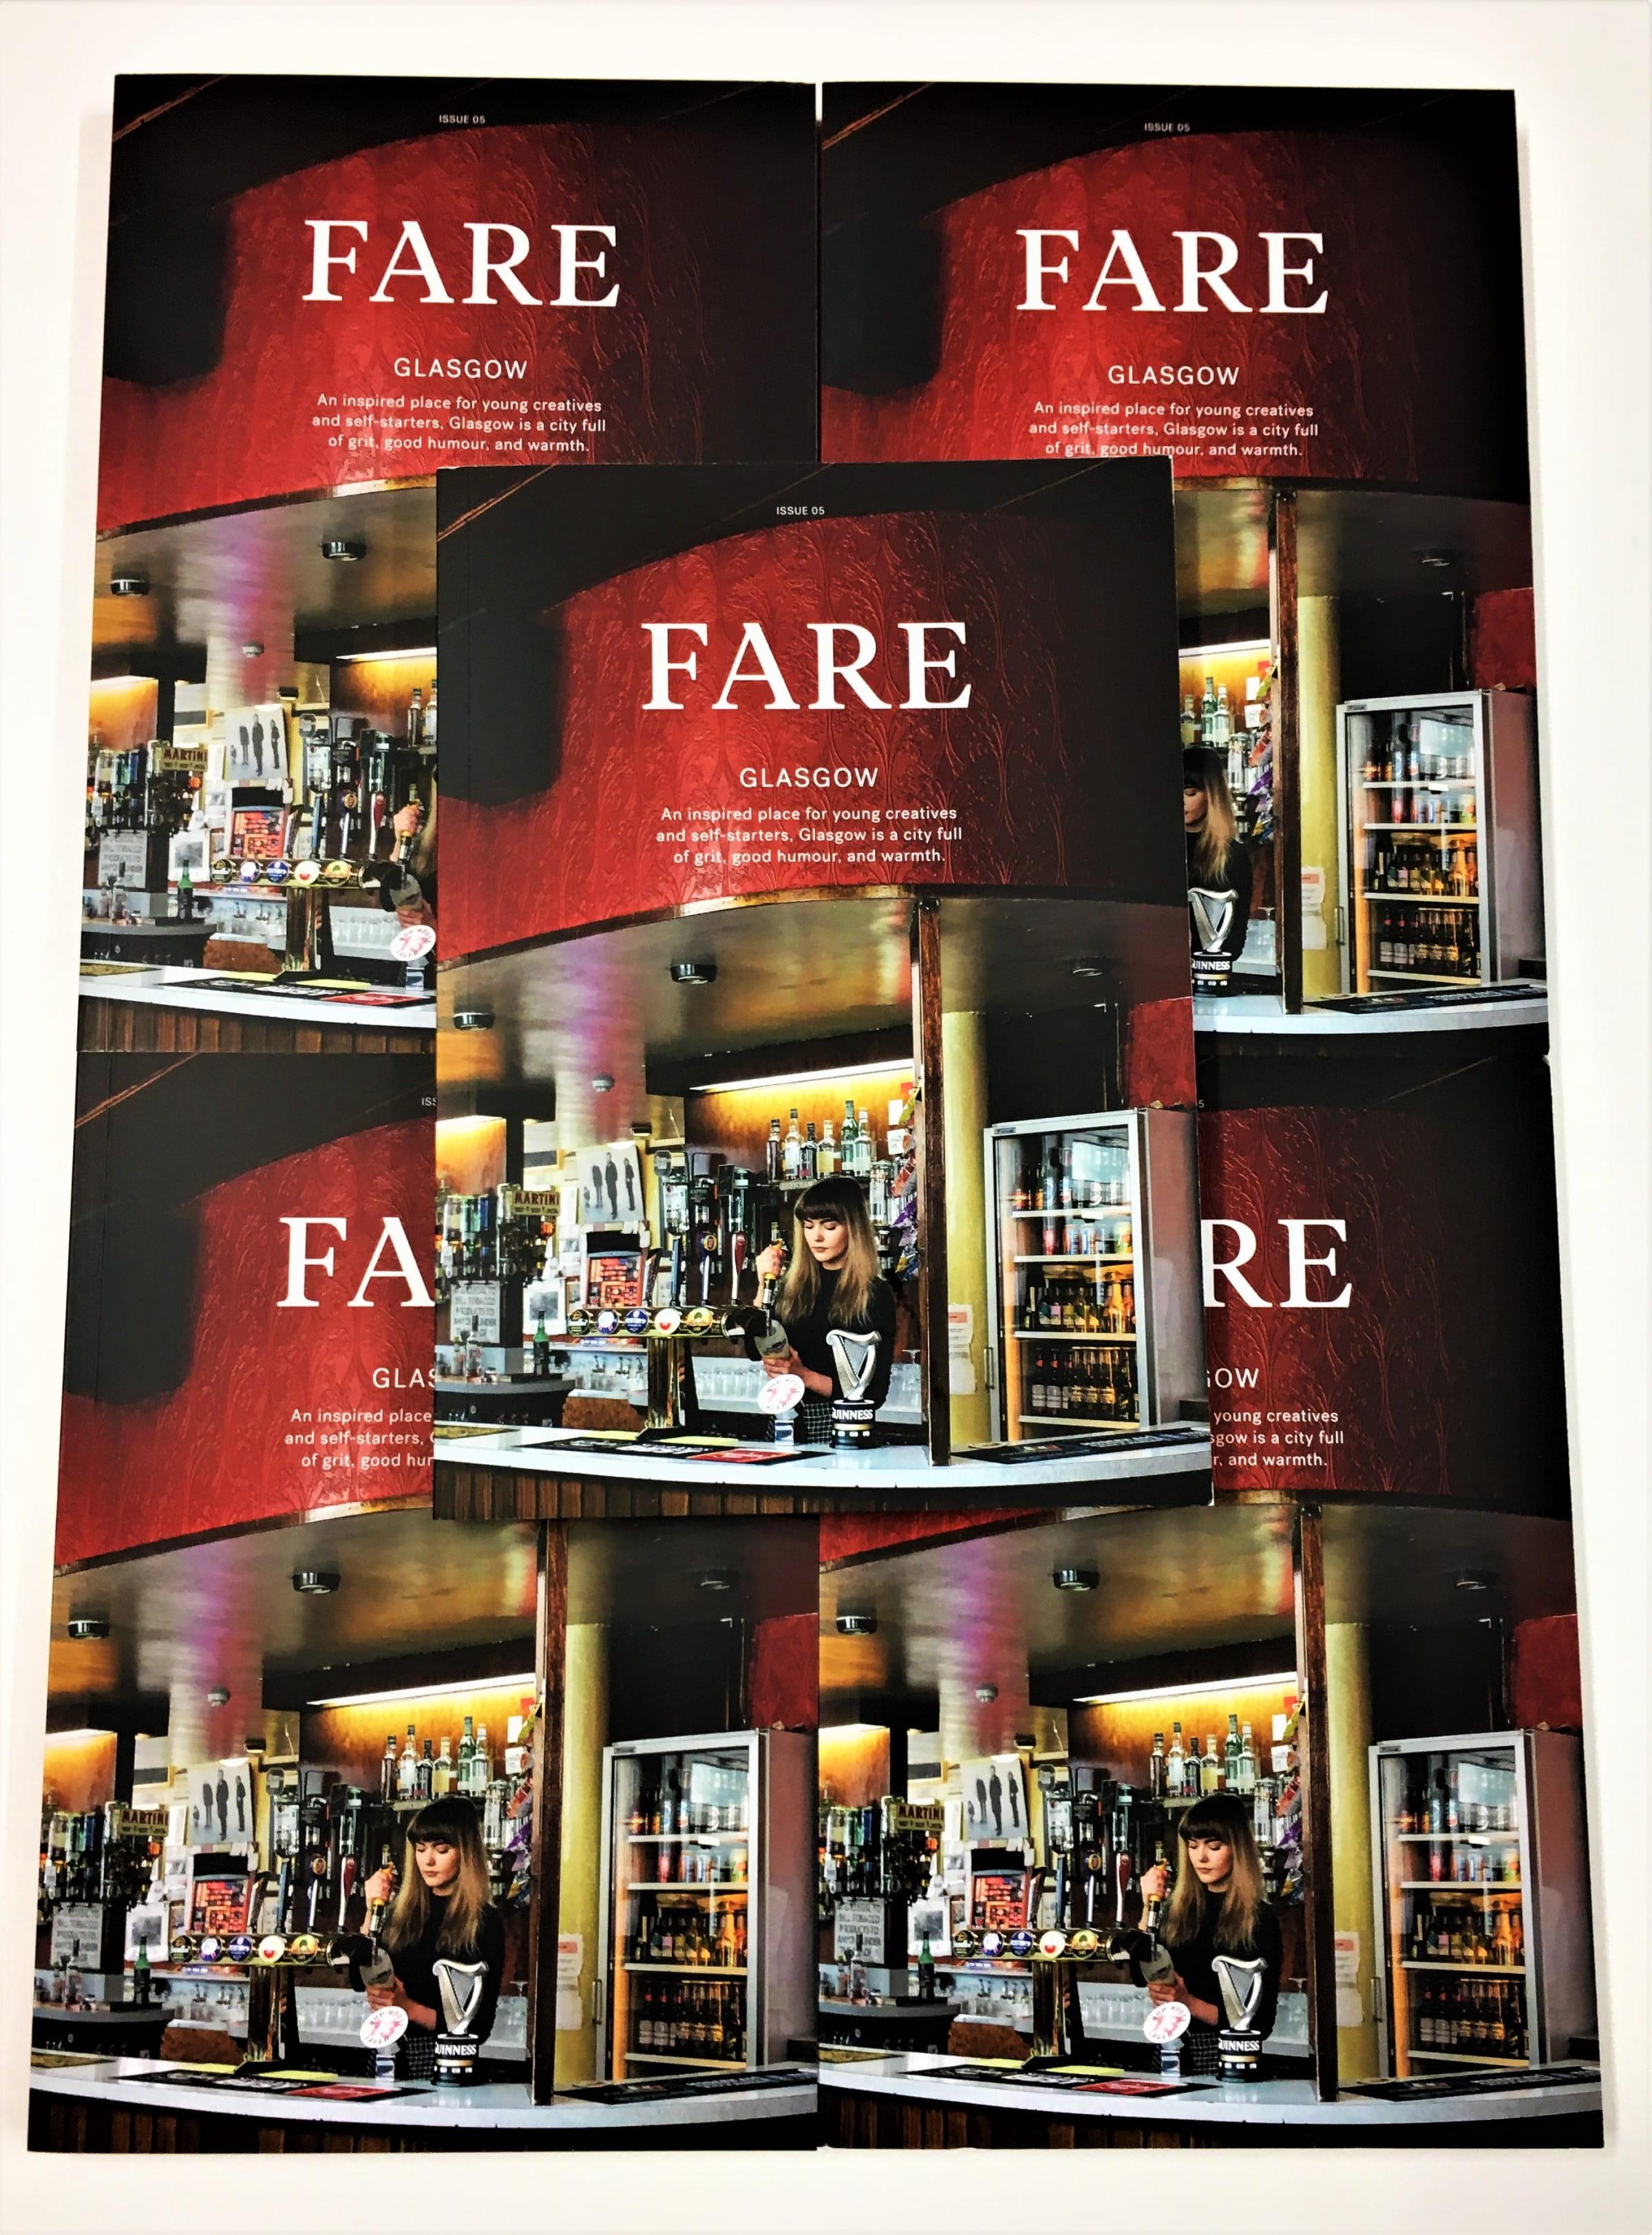 In Glasgow's Fare city... (Fare magazine turns its focus on Glasgow)